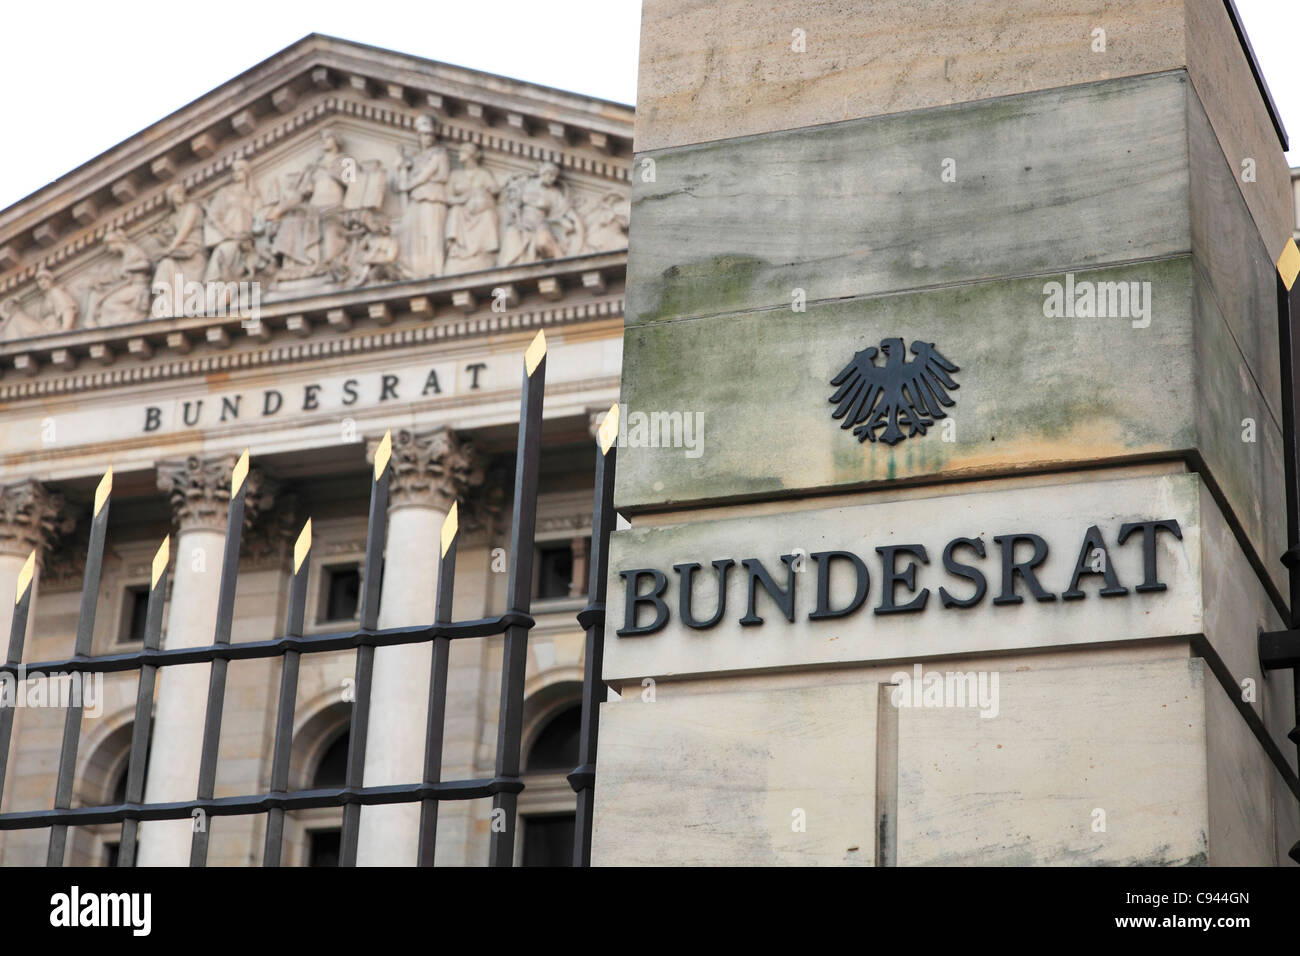 The Prussian House of Lords on Leipziger Straße seat of the German Bundesrat; Bundesrat der BR Deutschland - Stock Image